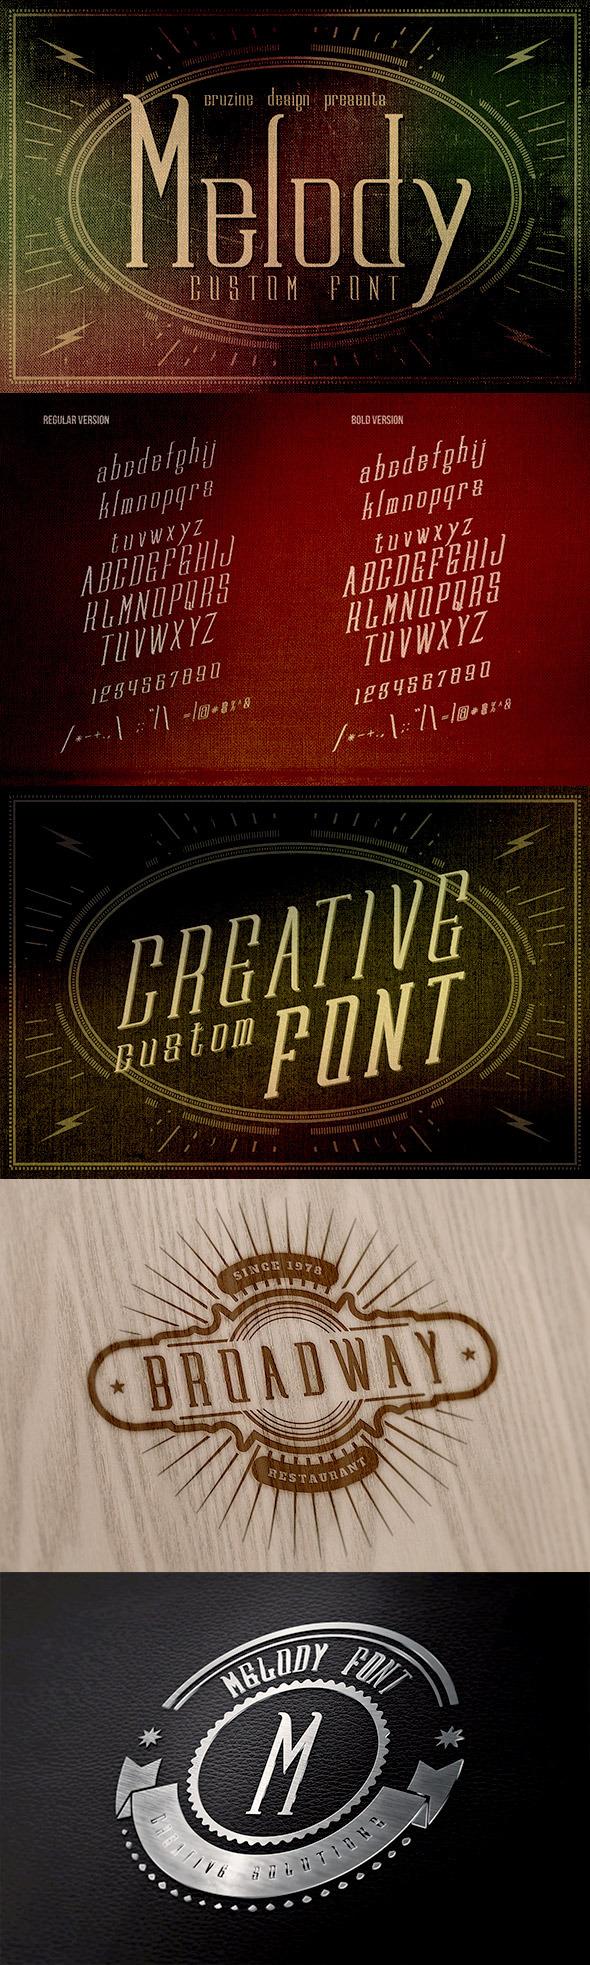 Melody Custom Font - Miscellaneous Serif